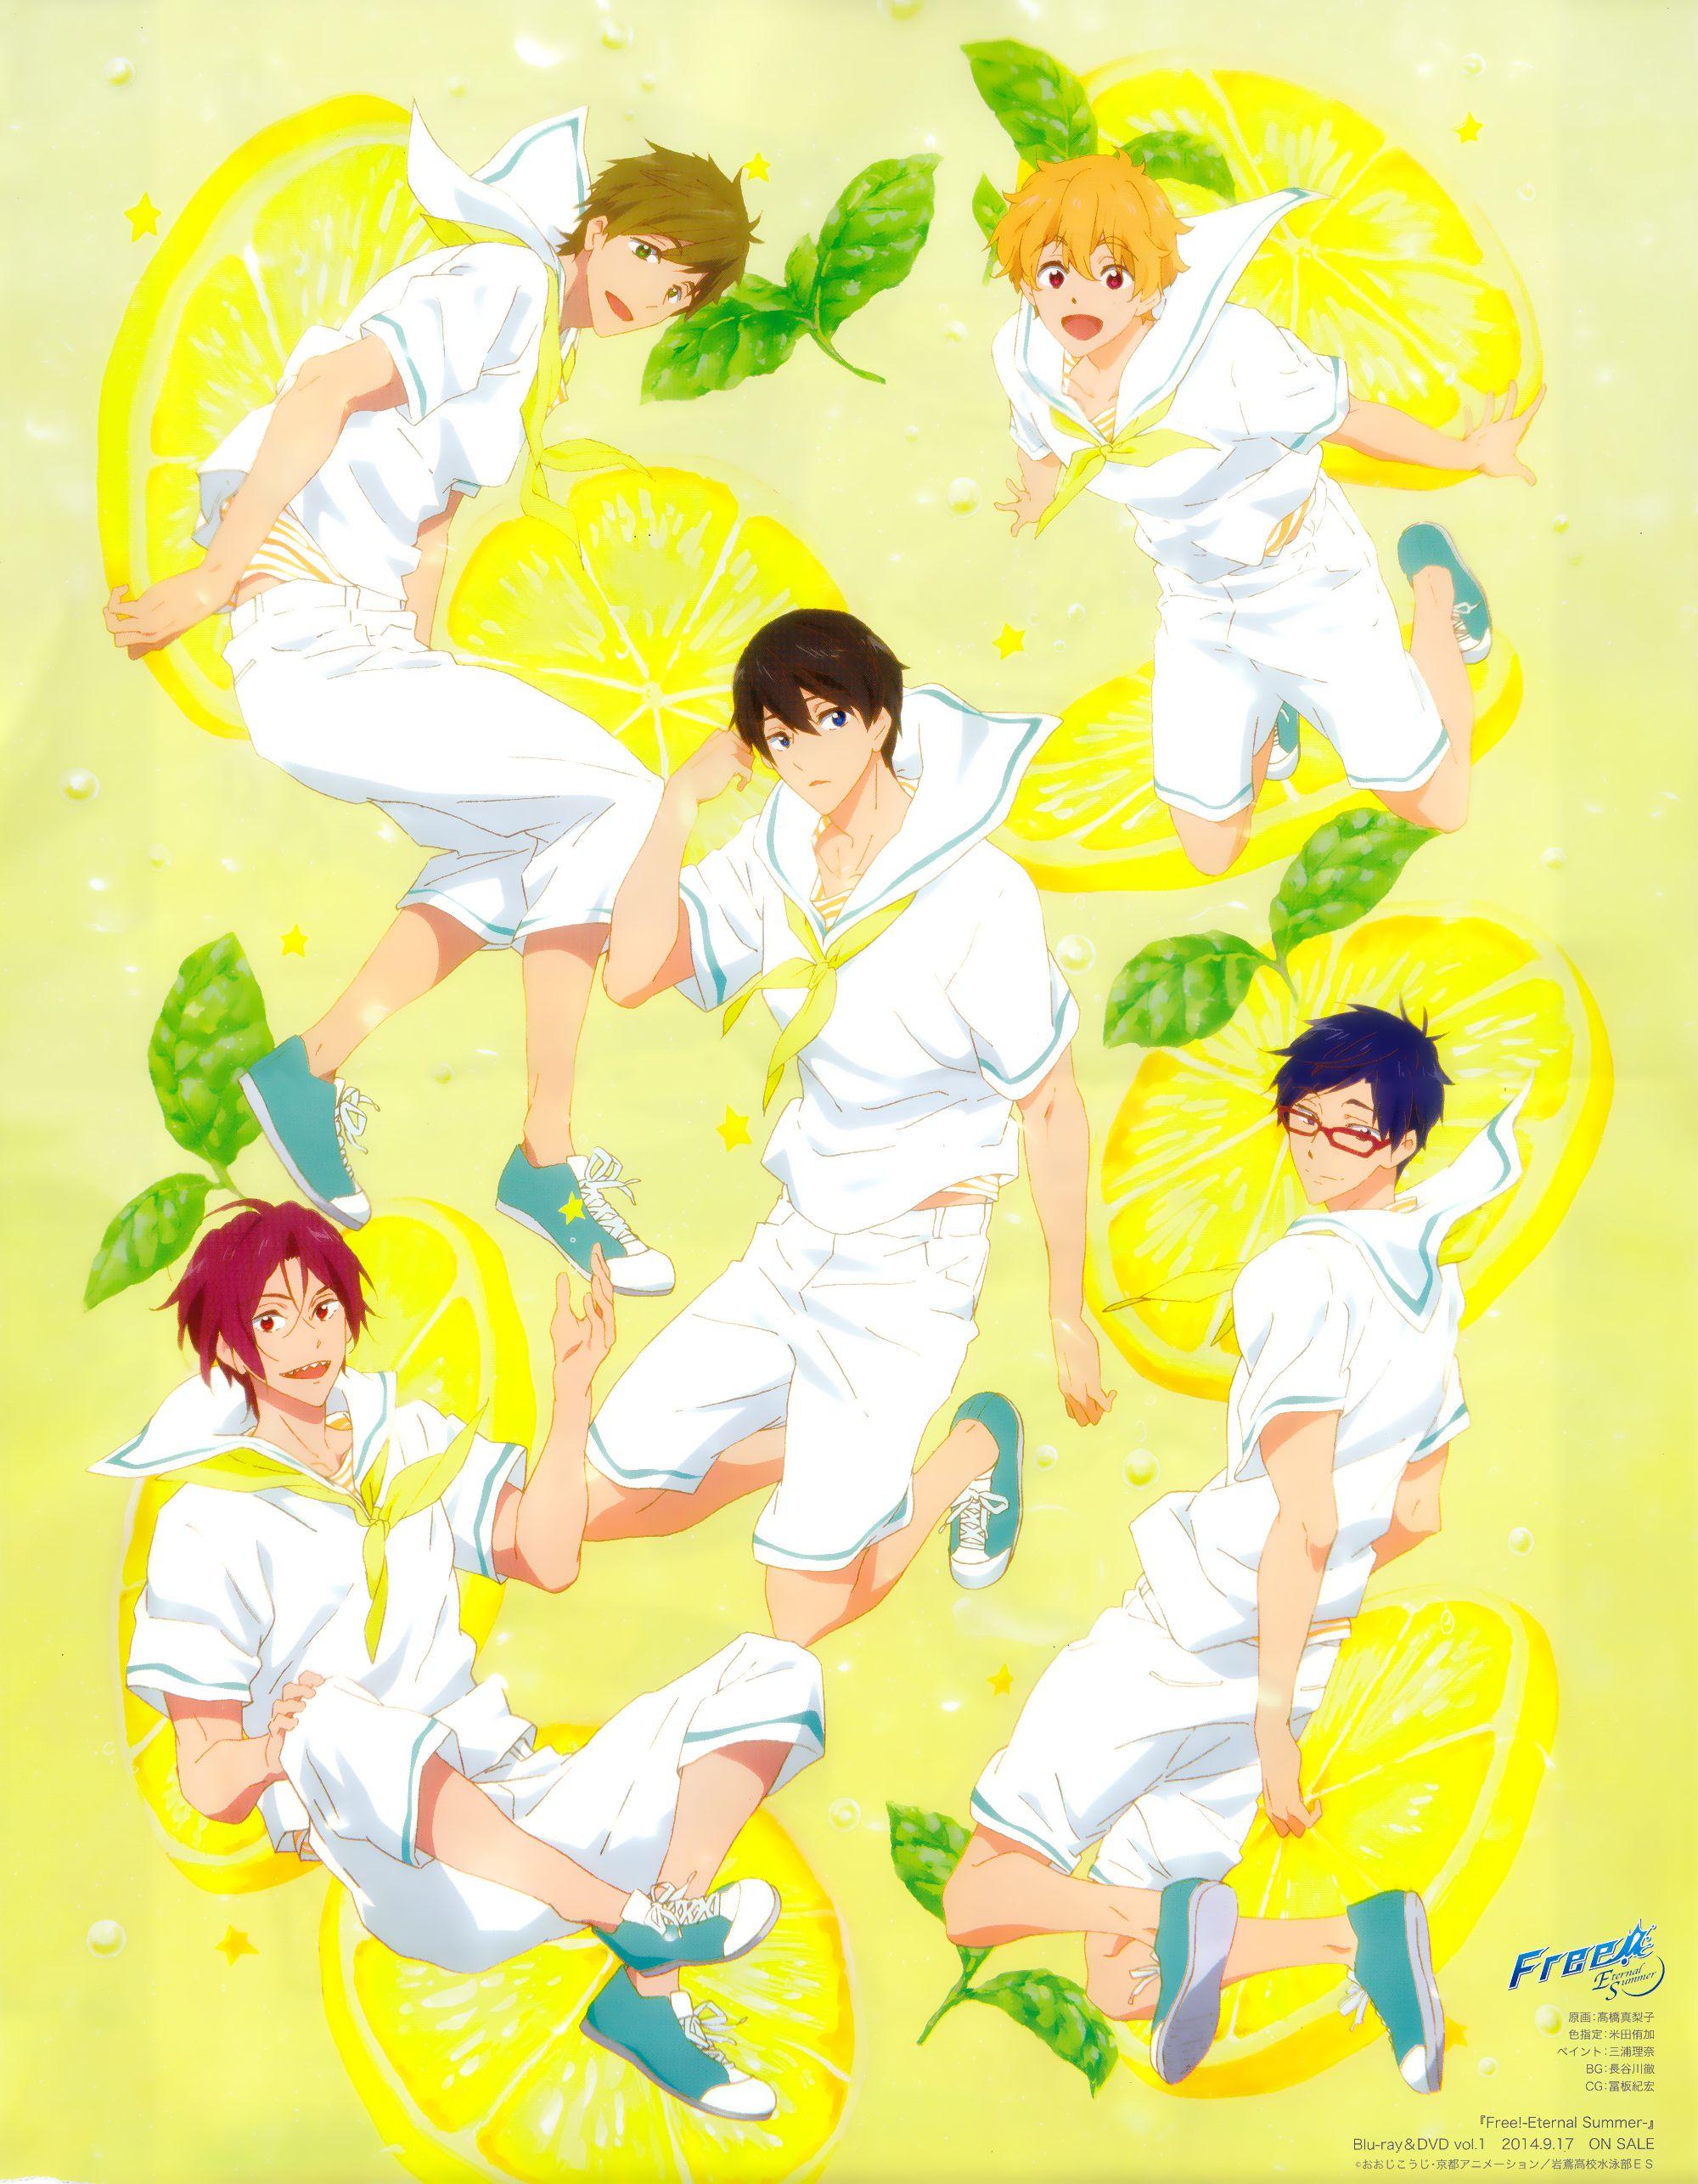 Fanfics lemon heterosexual definition